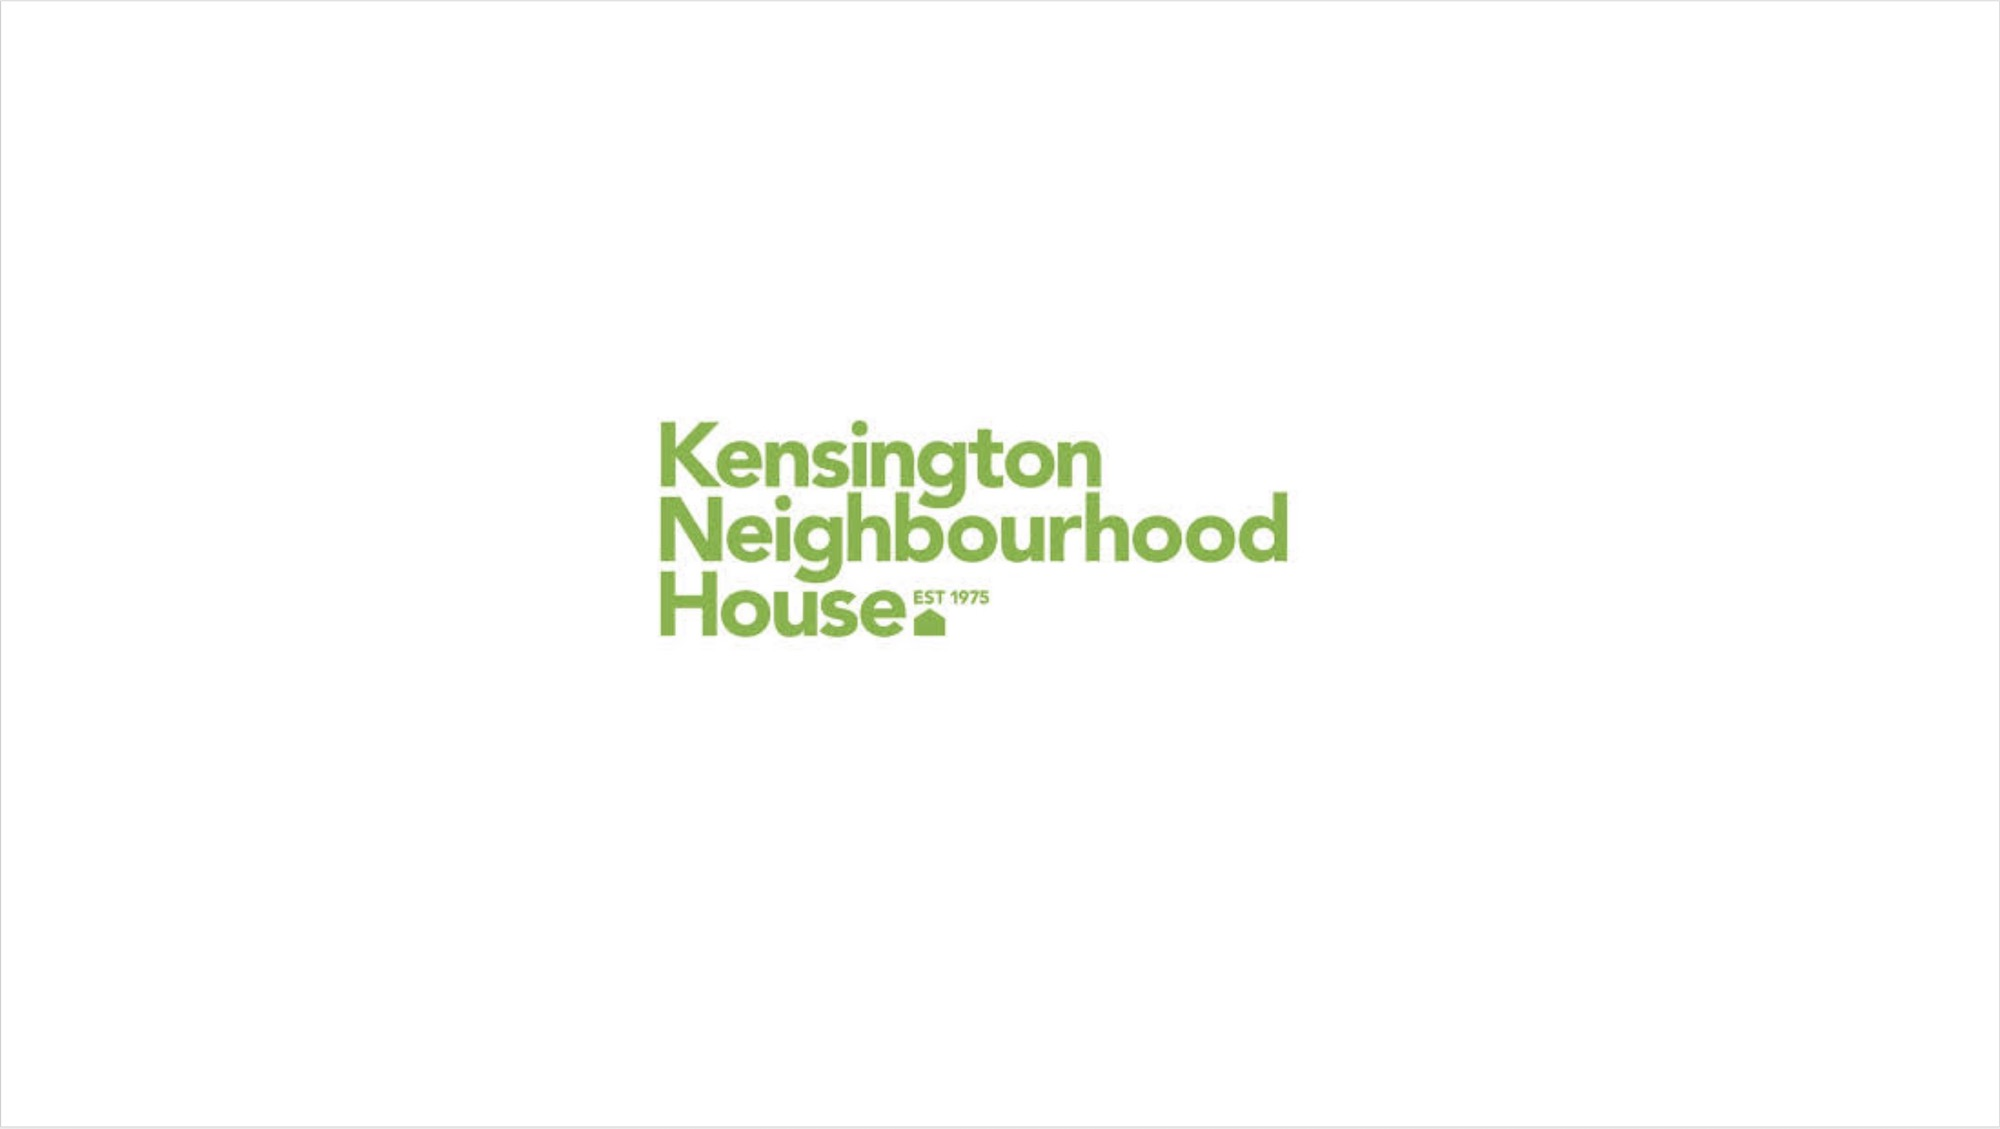 kenhouse_pitch1.jpg